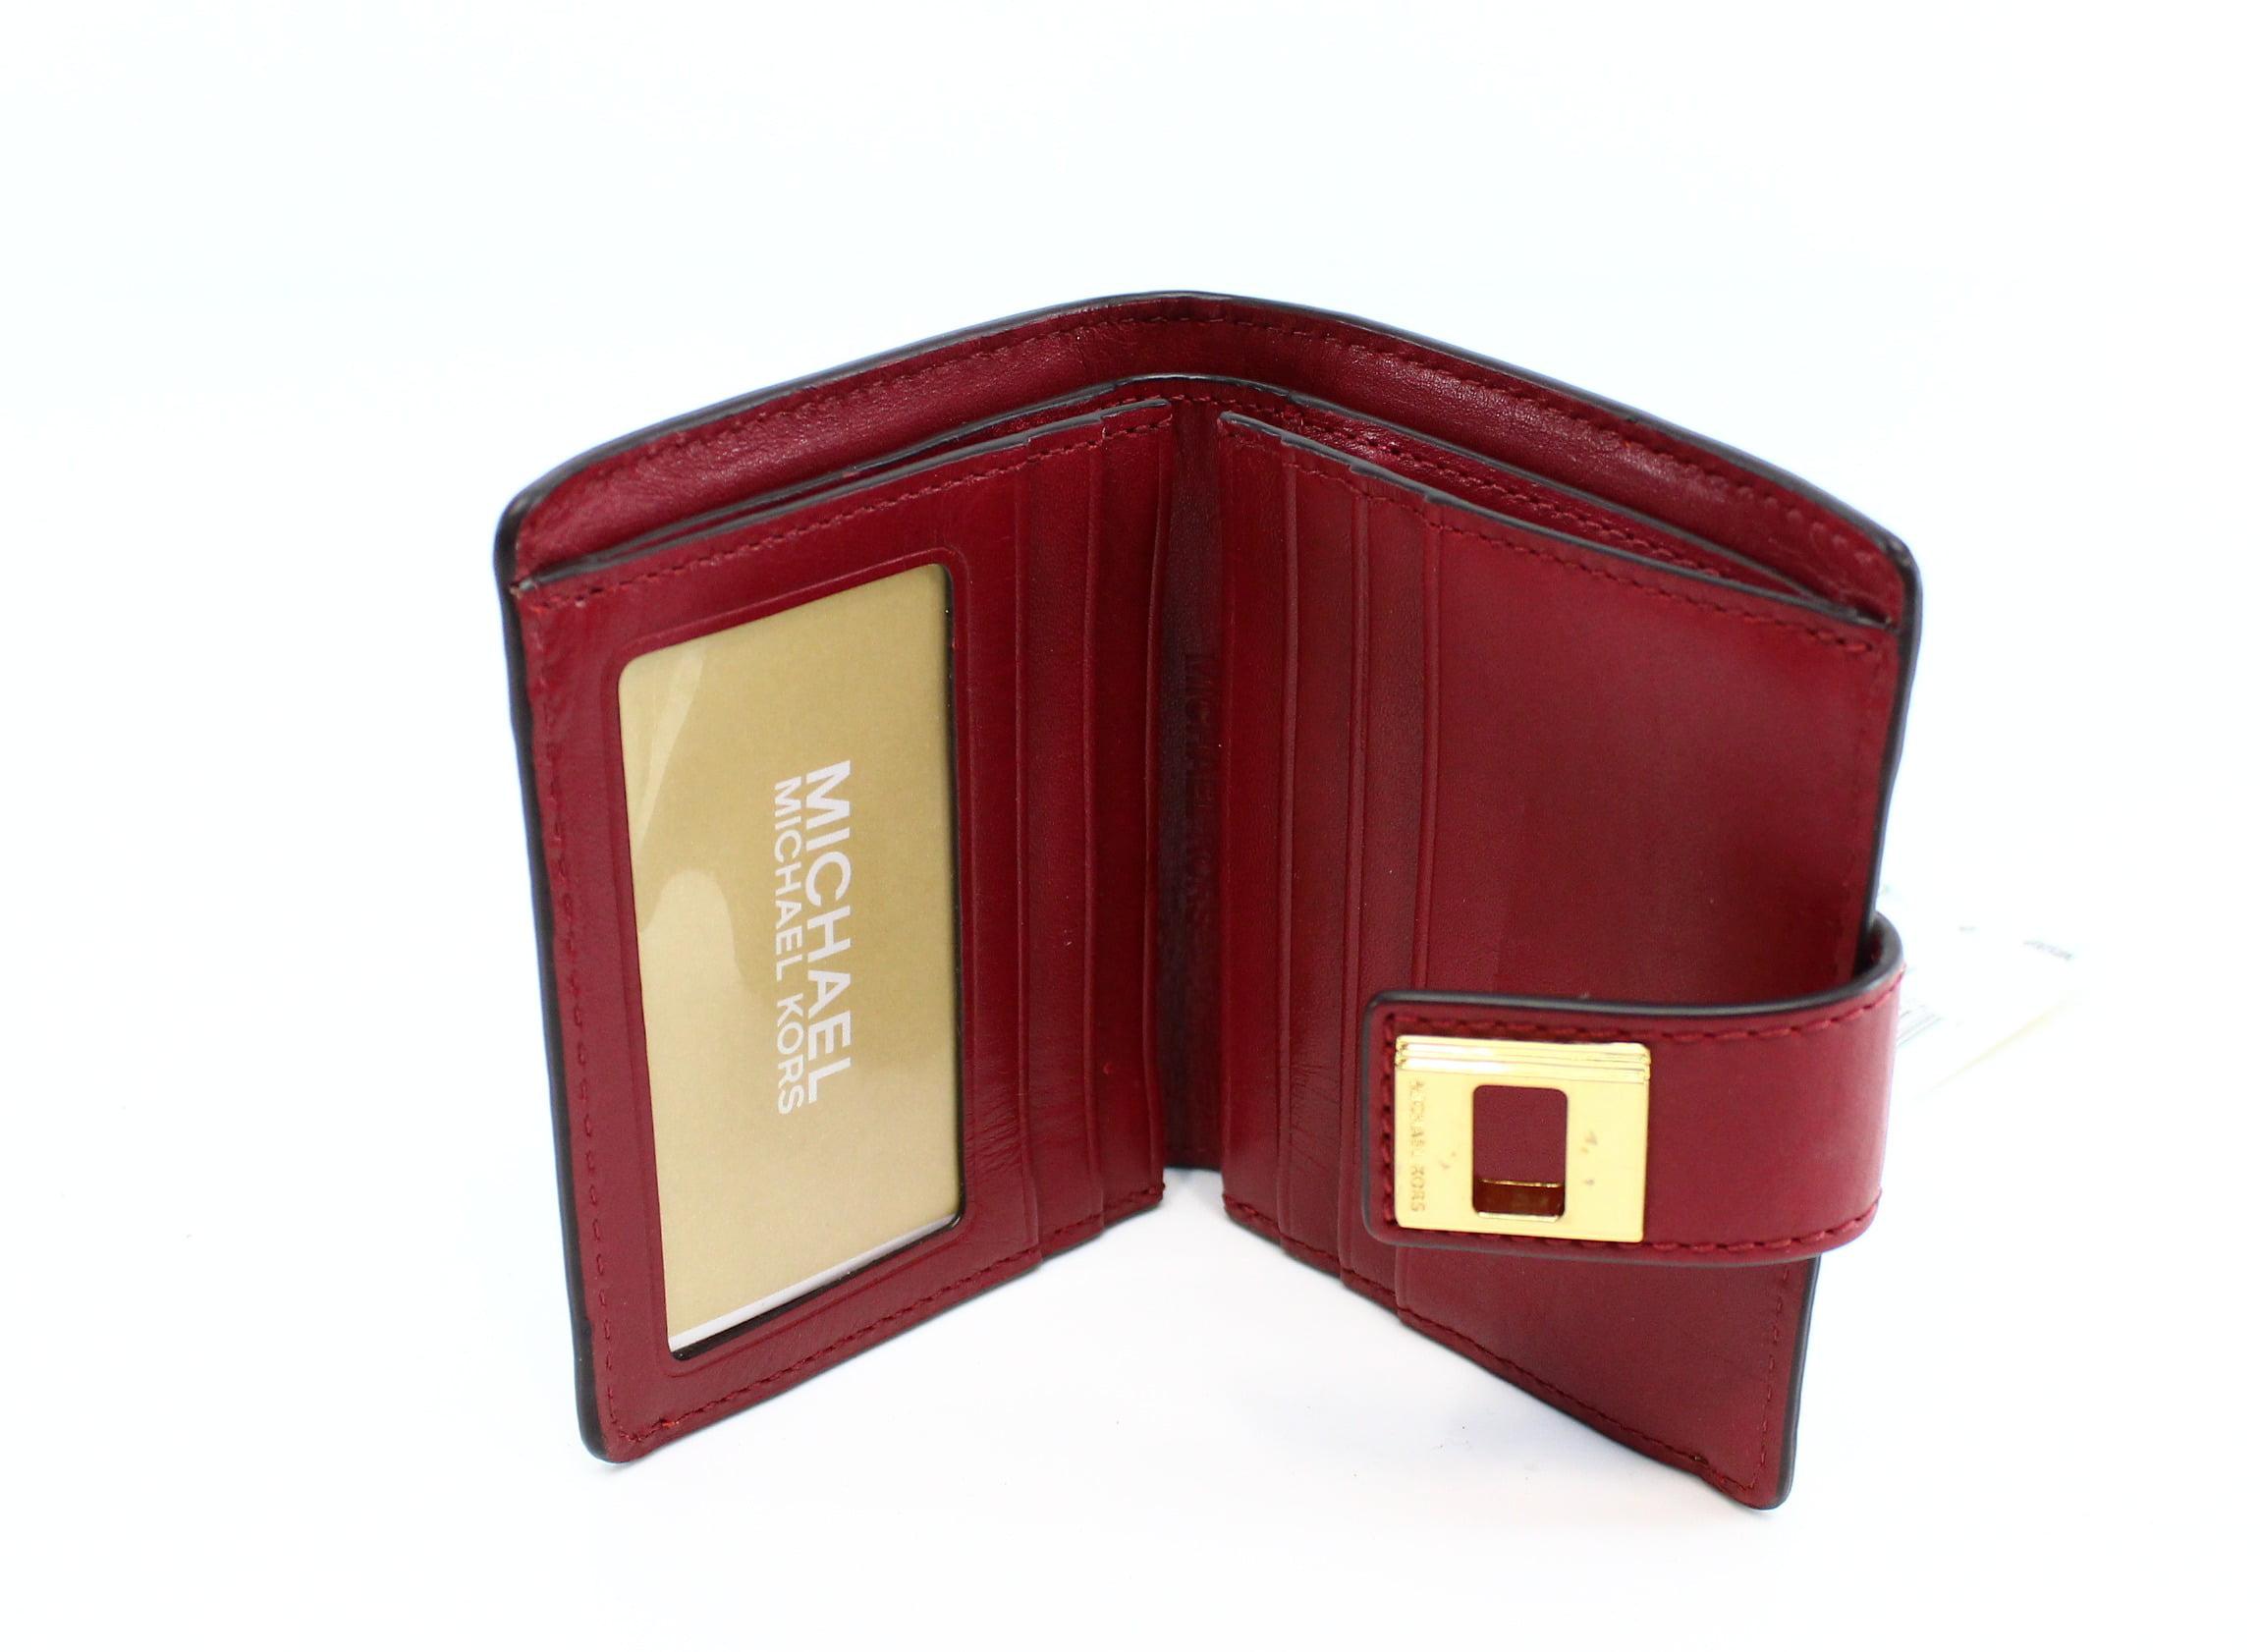 3a526869ca984b Michael Kors - Michael Kors NEW Natural Cherry Natalie Bifold Wallet Coated  Canvas - Walmart.com